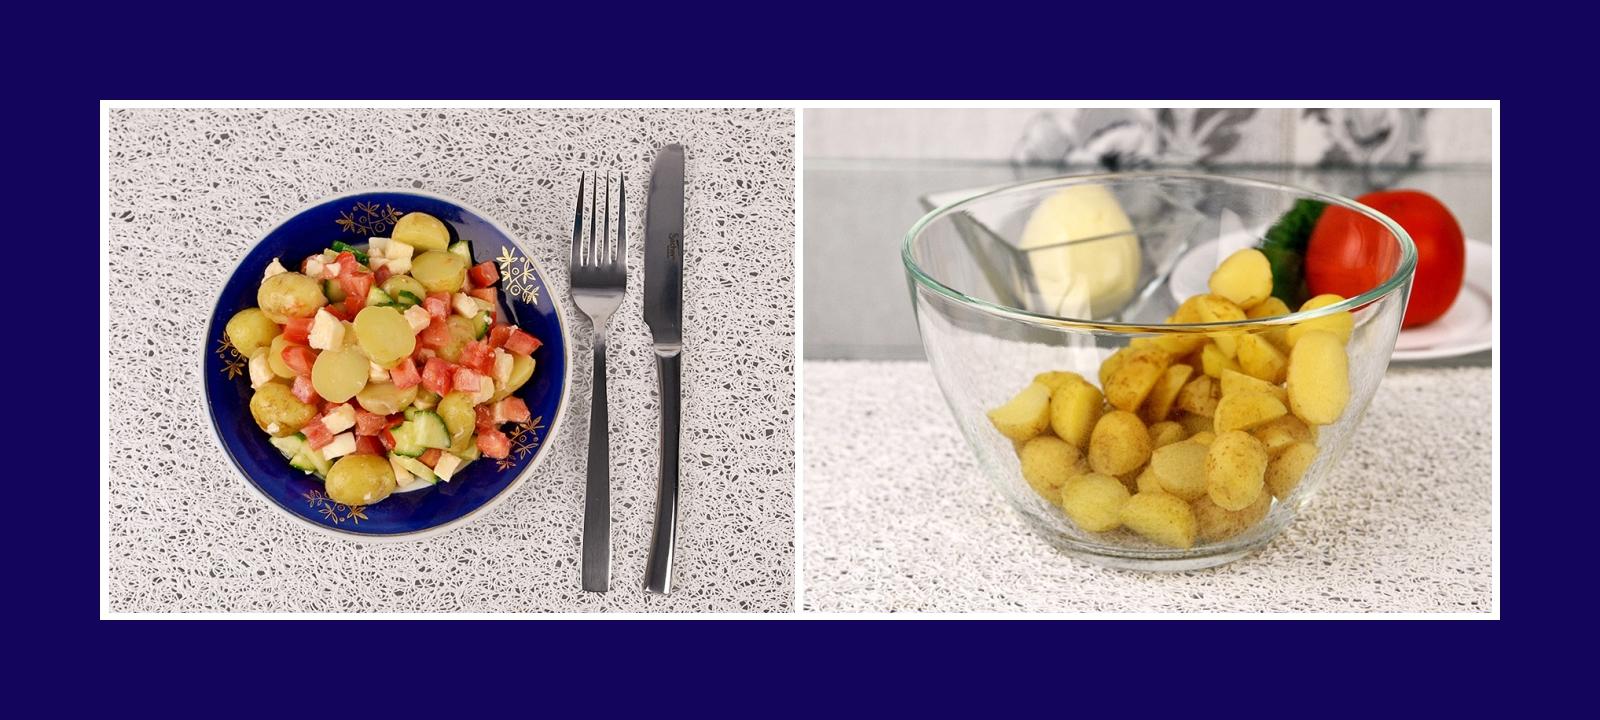 Salat aus Frühkartoffeln mit Mozzarrella